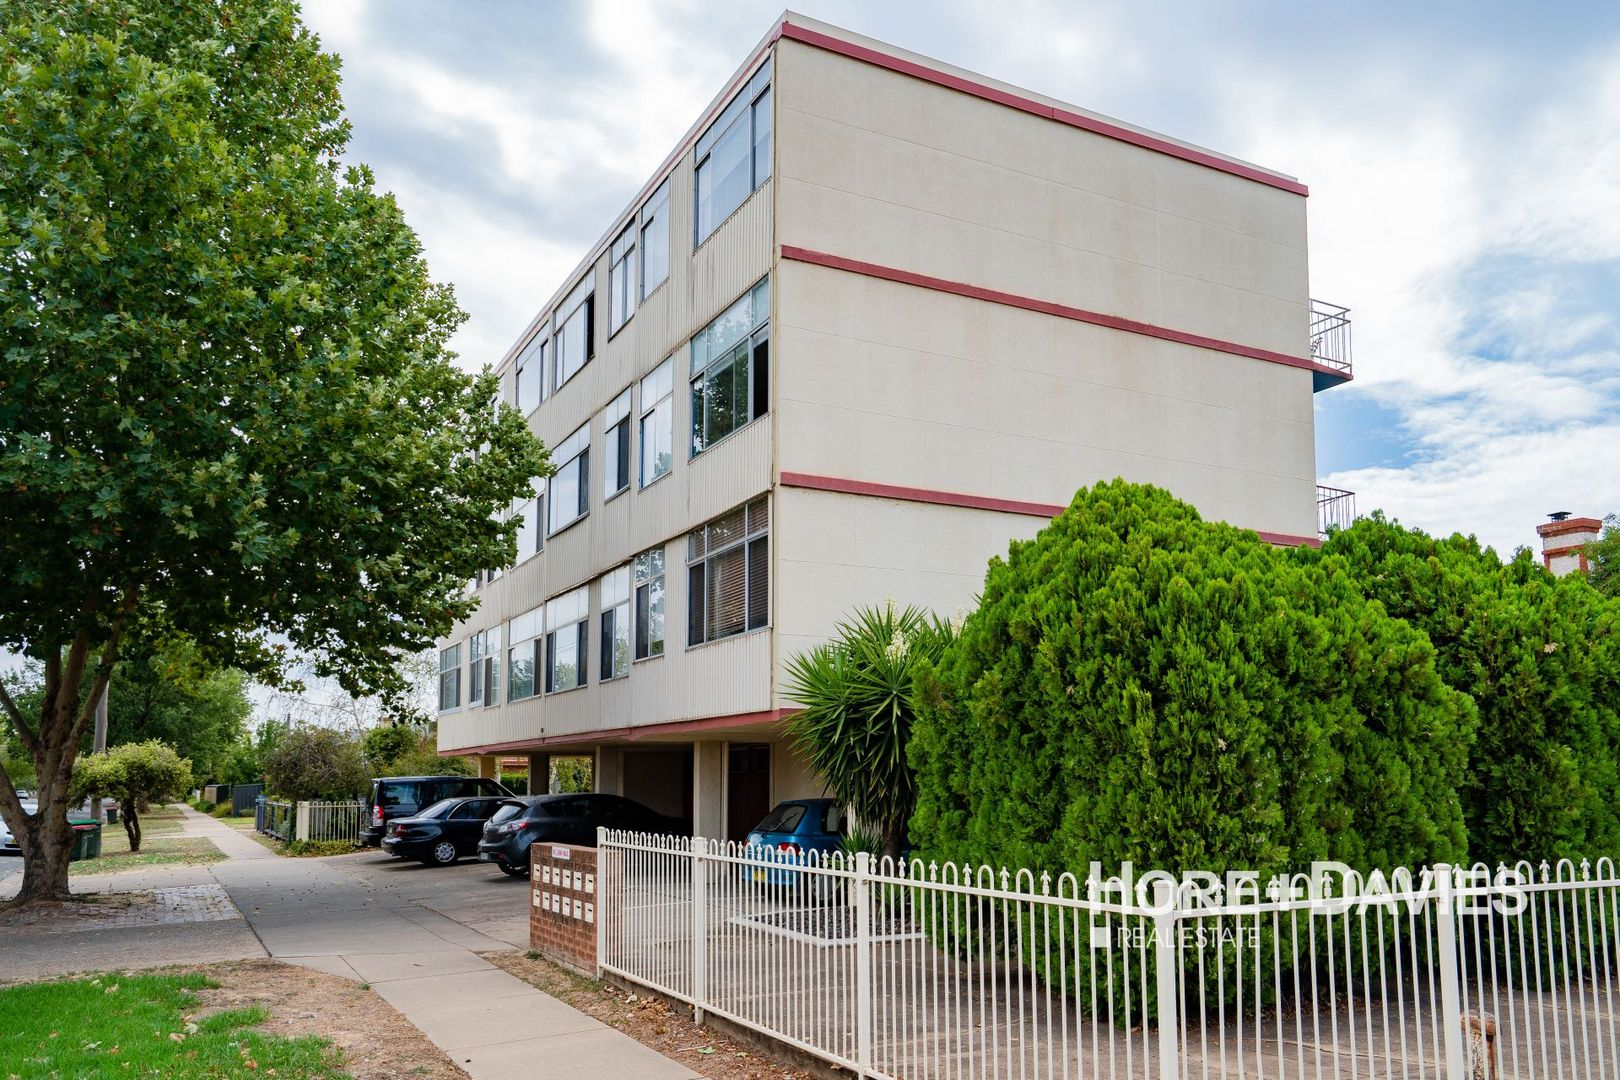 4/141 Gurwood Street, Wagga Wagga NSW 2650, Image 0